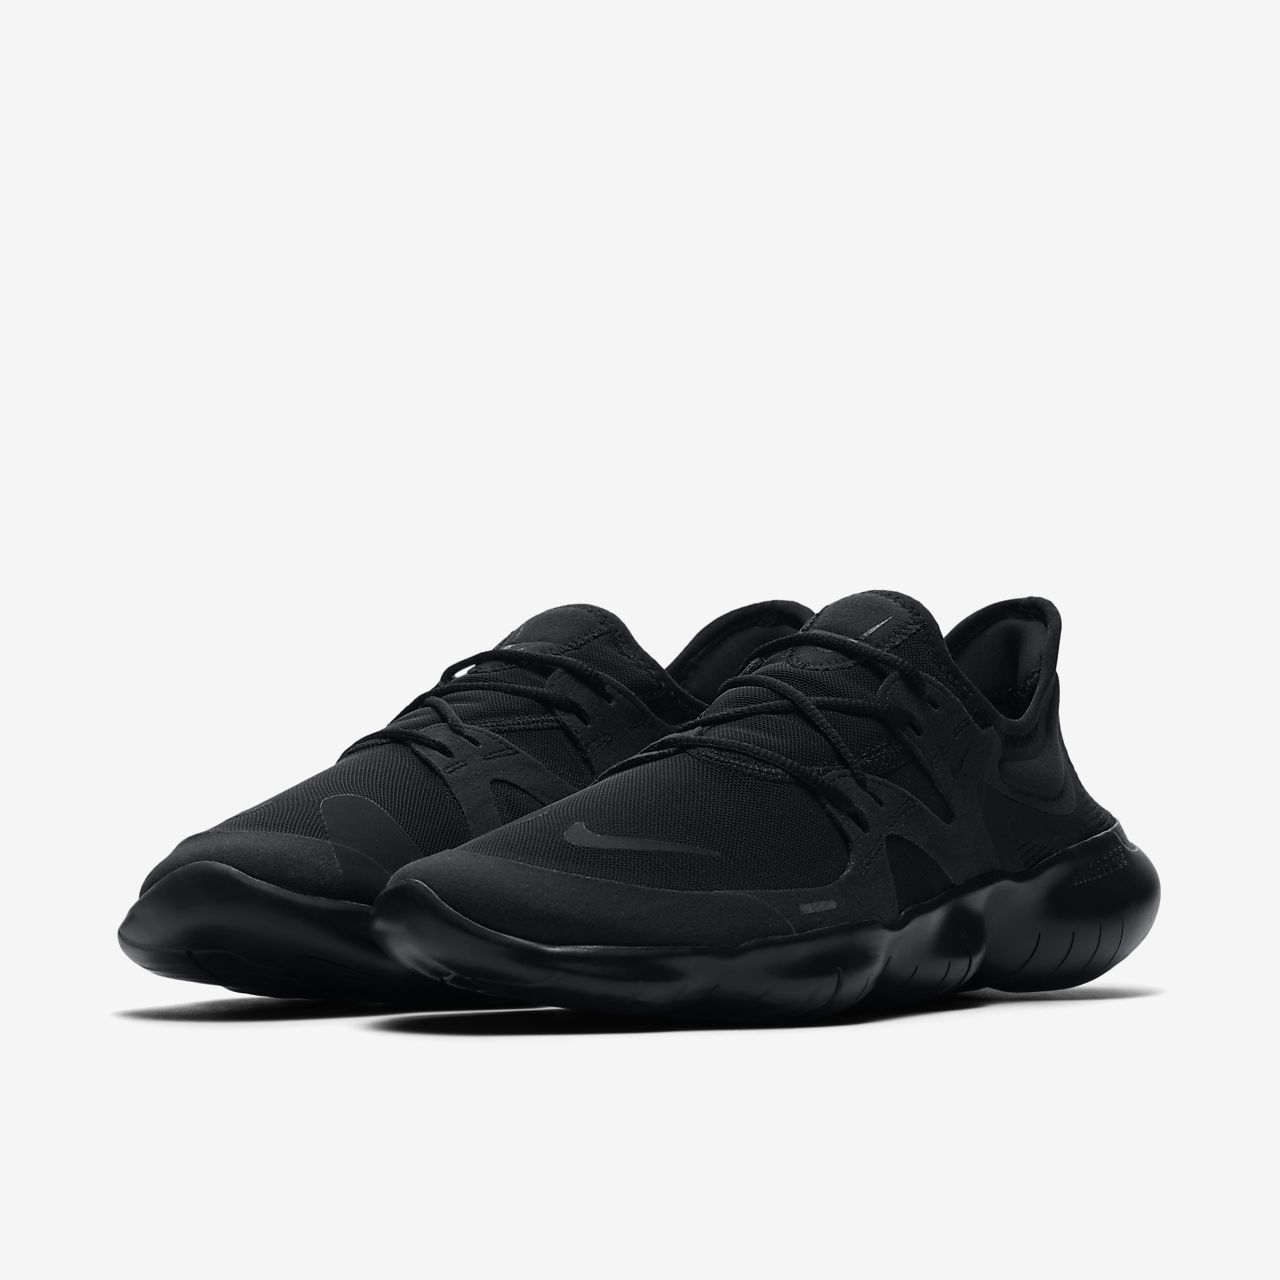 Nike Free Trainer 3.0 V4 Mens Sneaker Wolf GreyWhite Black 749361 010 Size 14